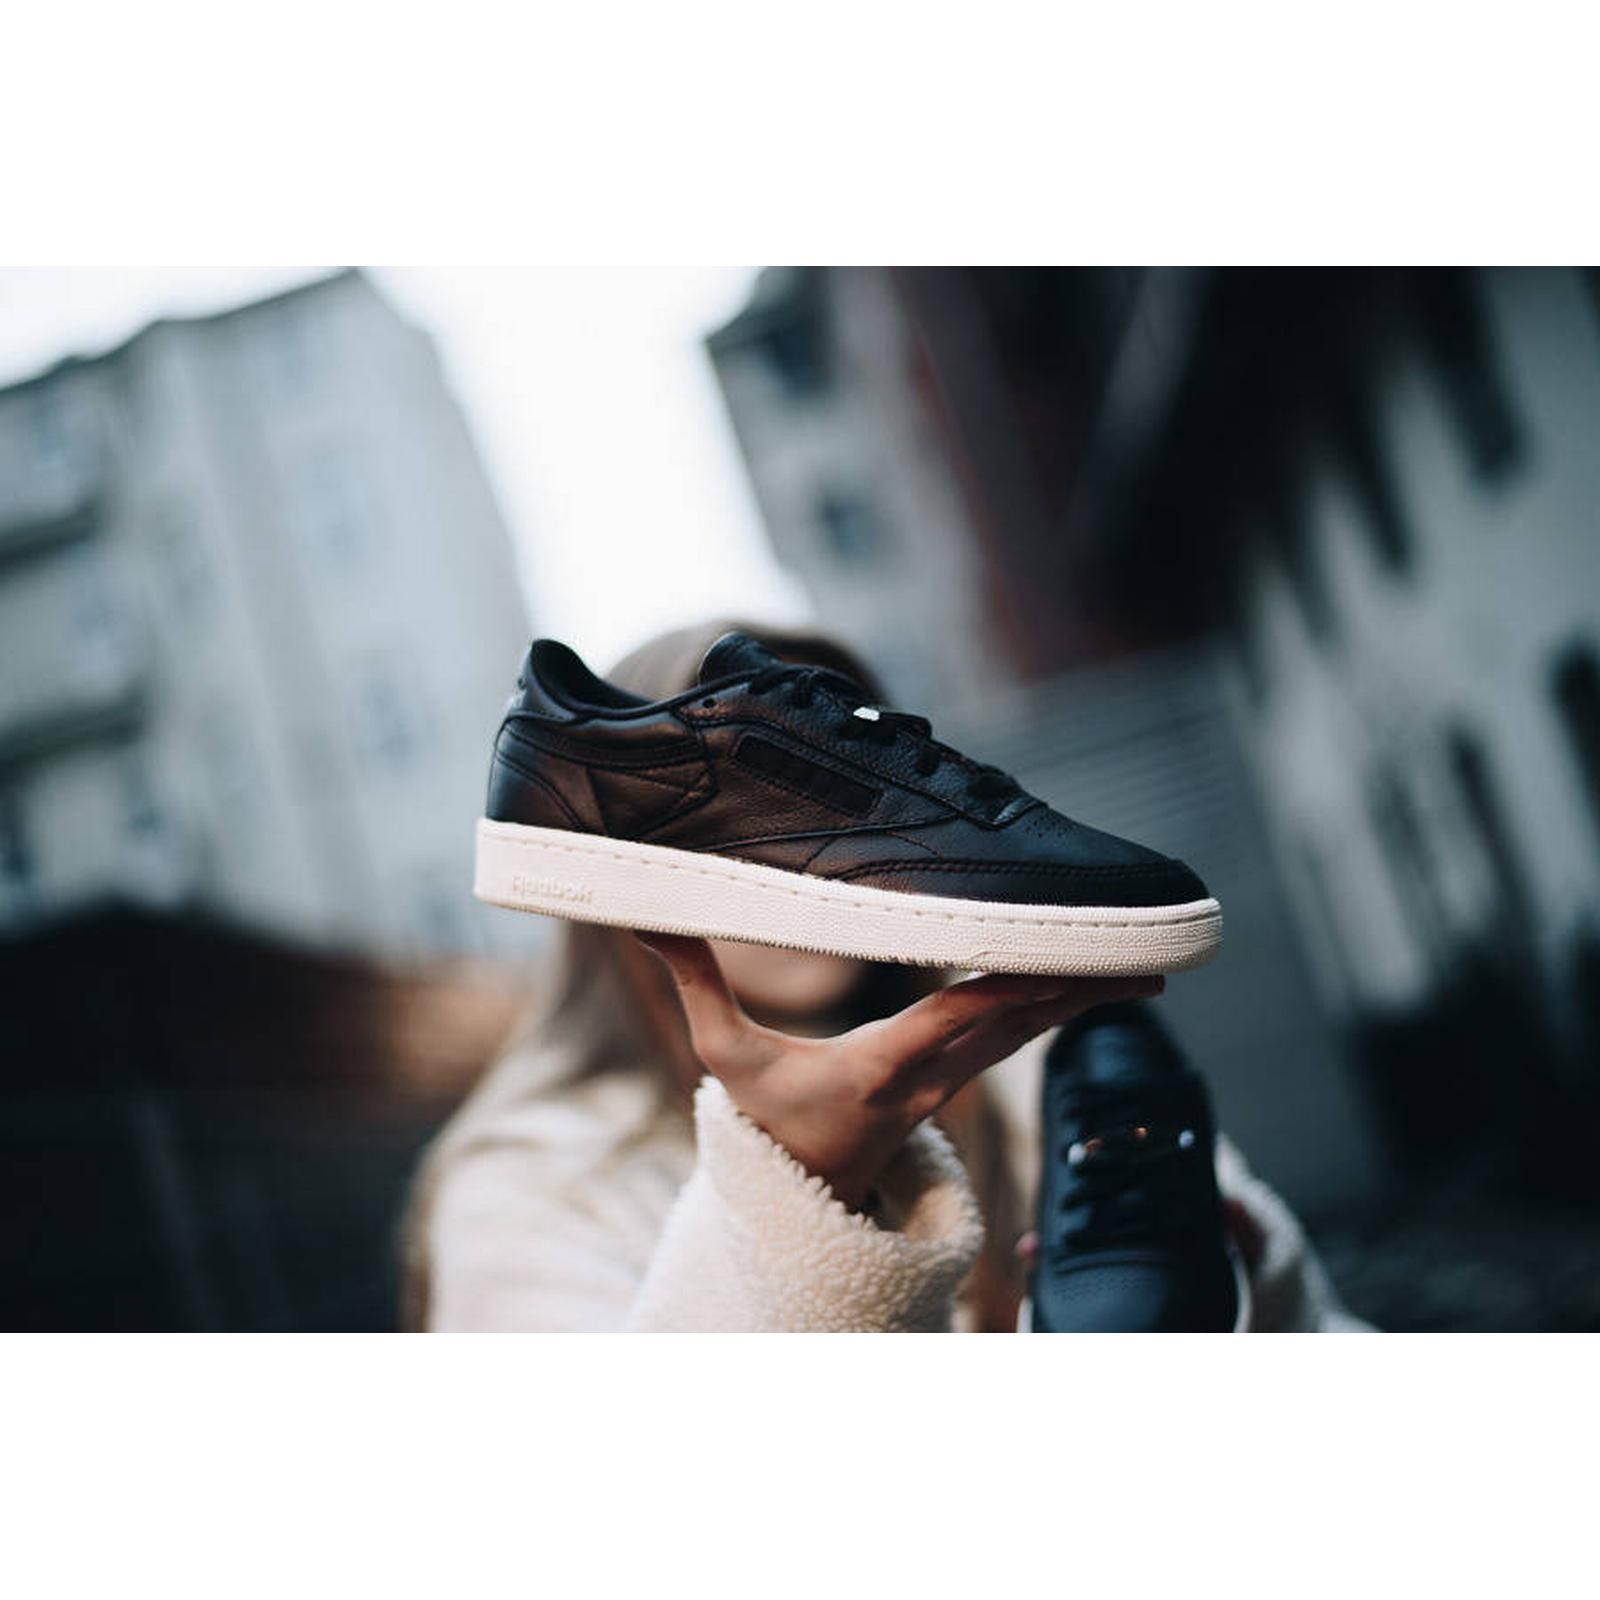 Reebok Classic Women's Shoes sneakers Reebok Club C BLACK 85 Hardware Black BS9596 BLACK C Size 40 236eed